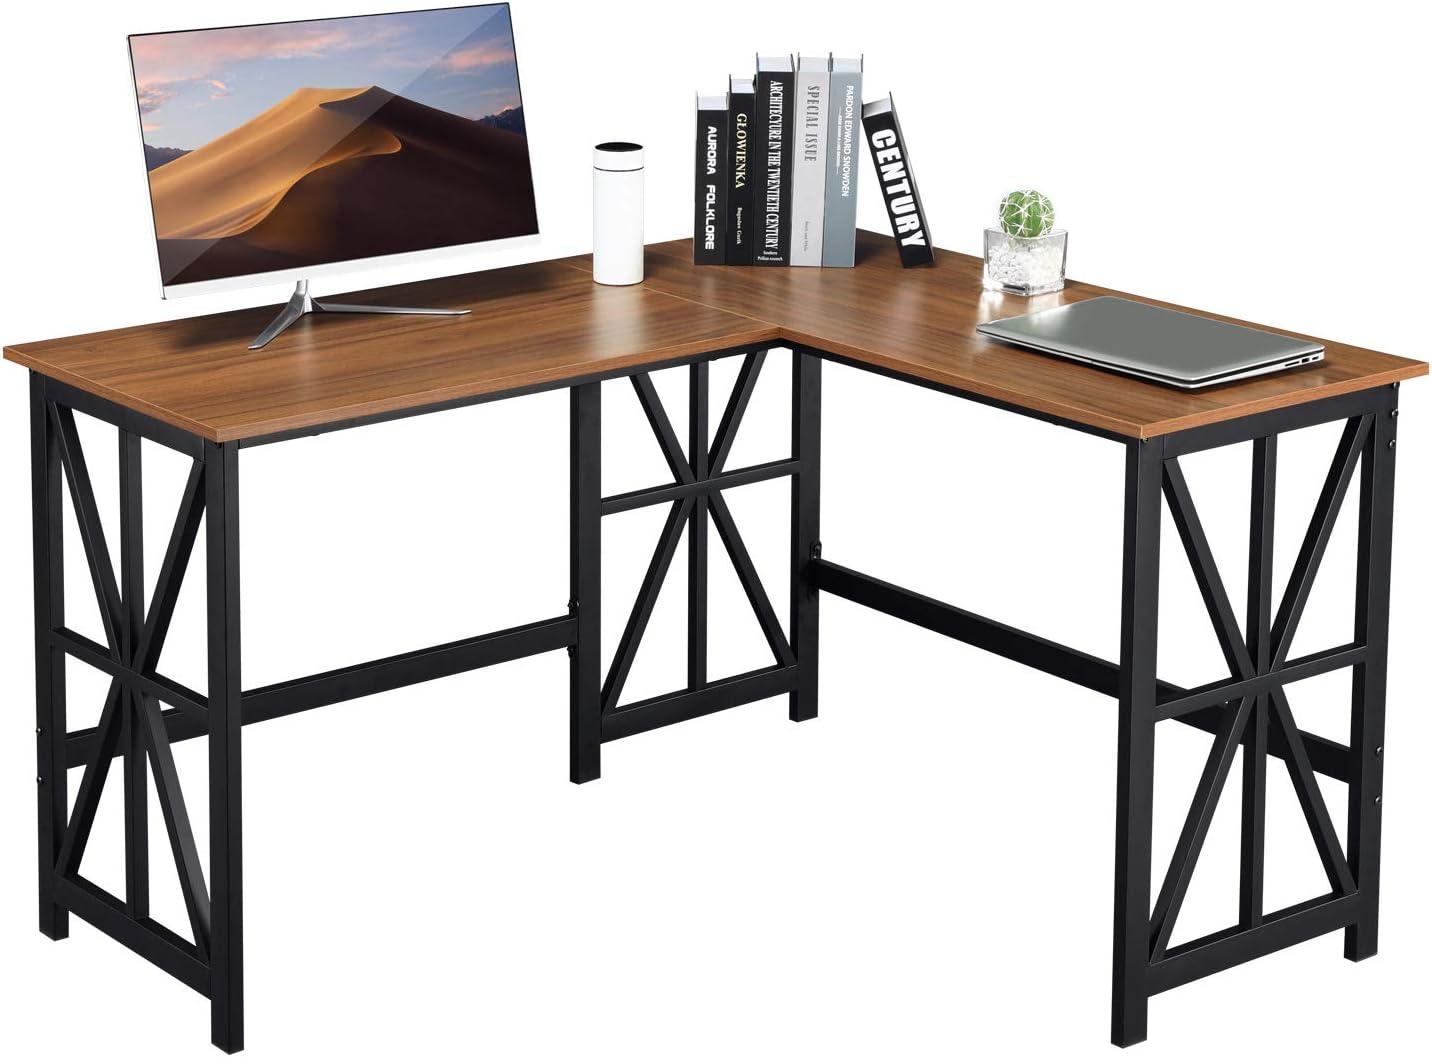 "GreenForest L Shaped Corner Desk 50.4"" Industrial Style Reversible Computer Gaming Desk PC Laptop Workstation for Home Office, Walnut"